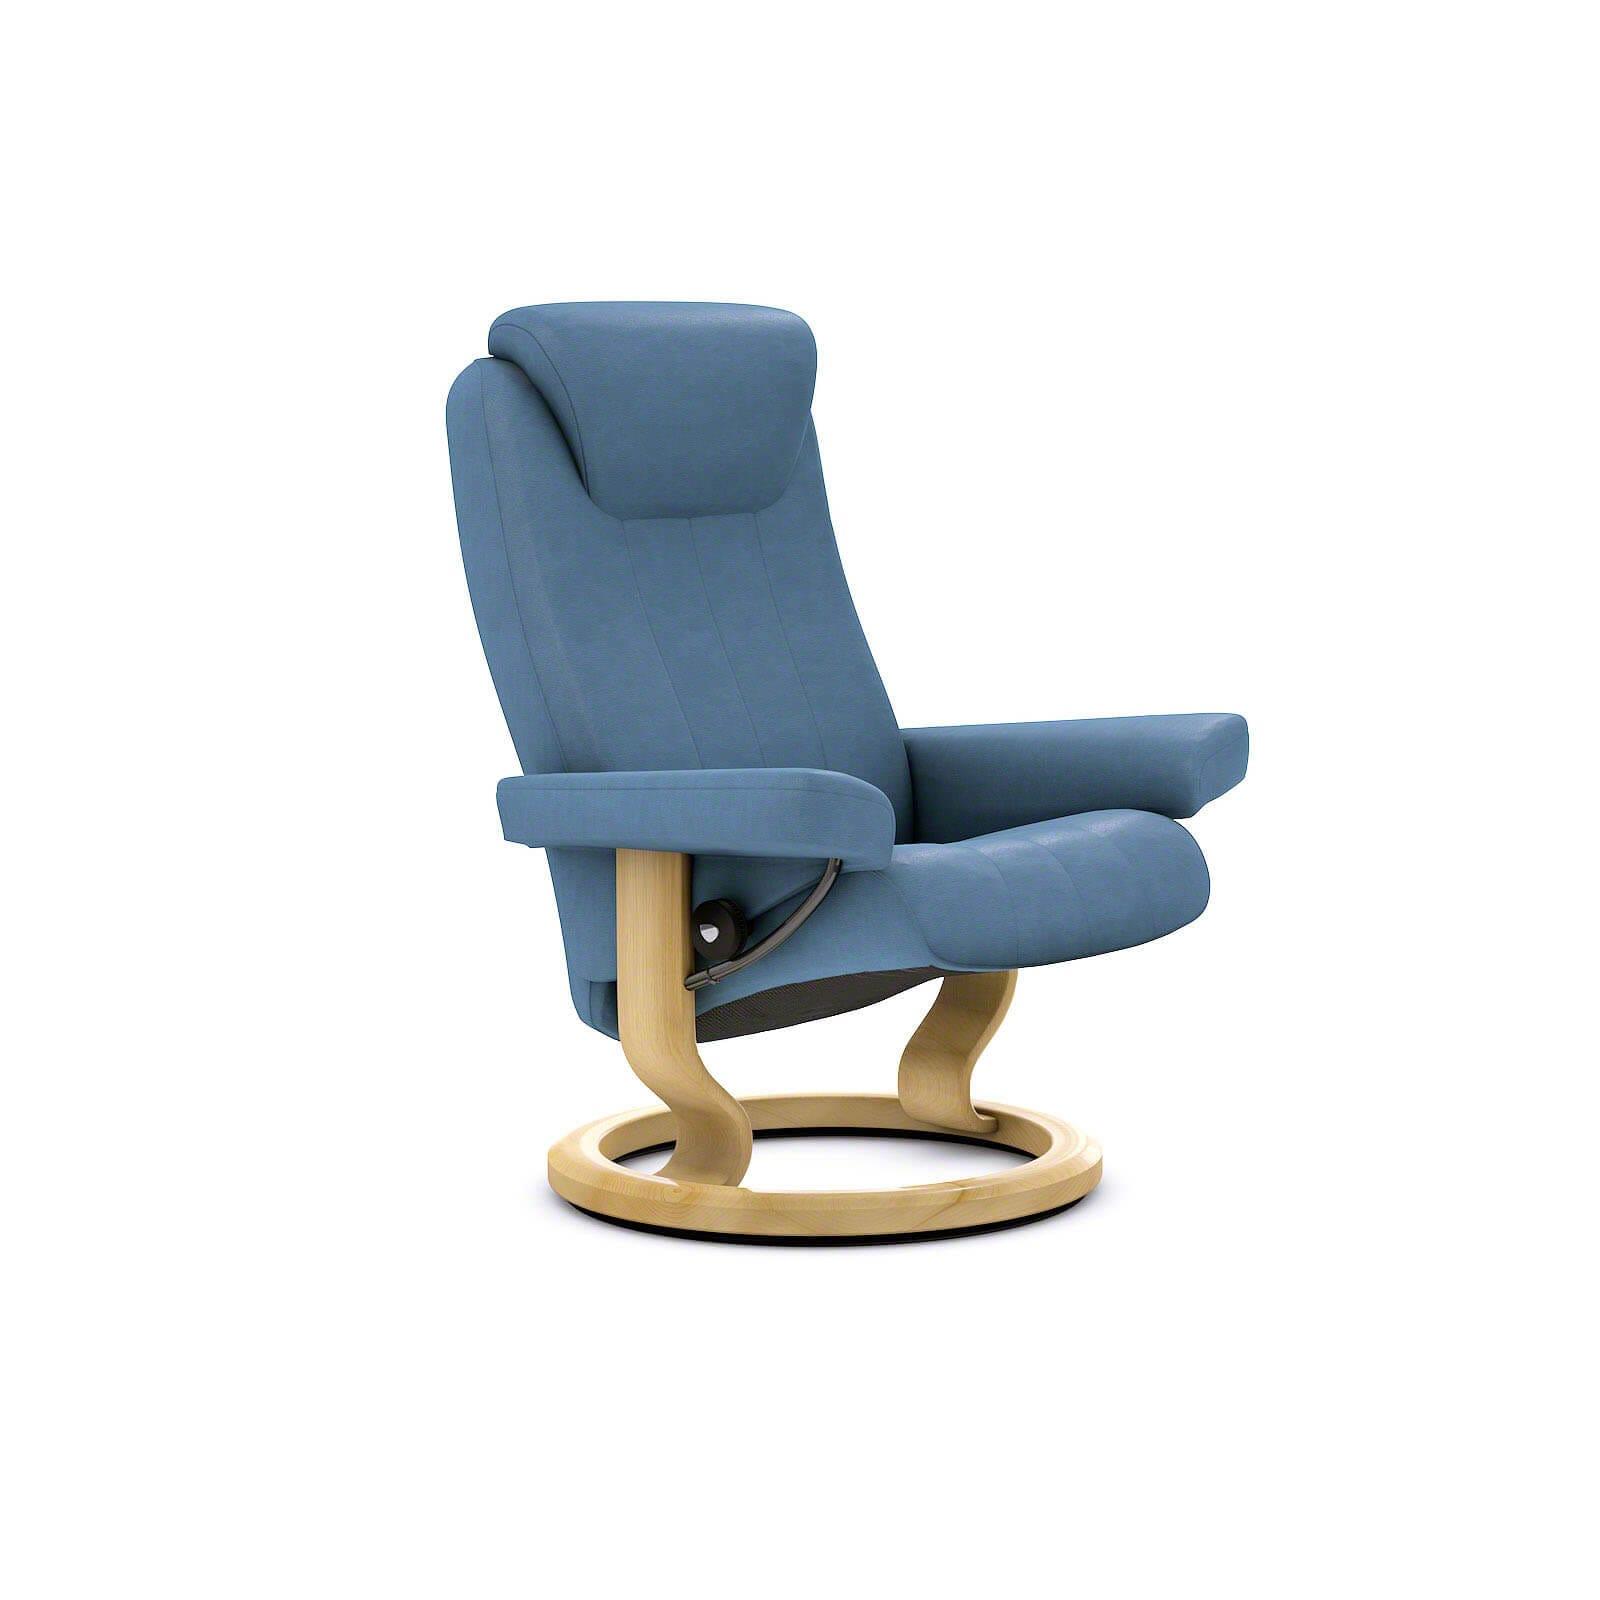 stressless bliss sessel sparrow blue ohne hocker stressless. Black Bedroom Furniture Sets. Home Design Ideas